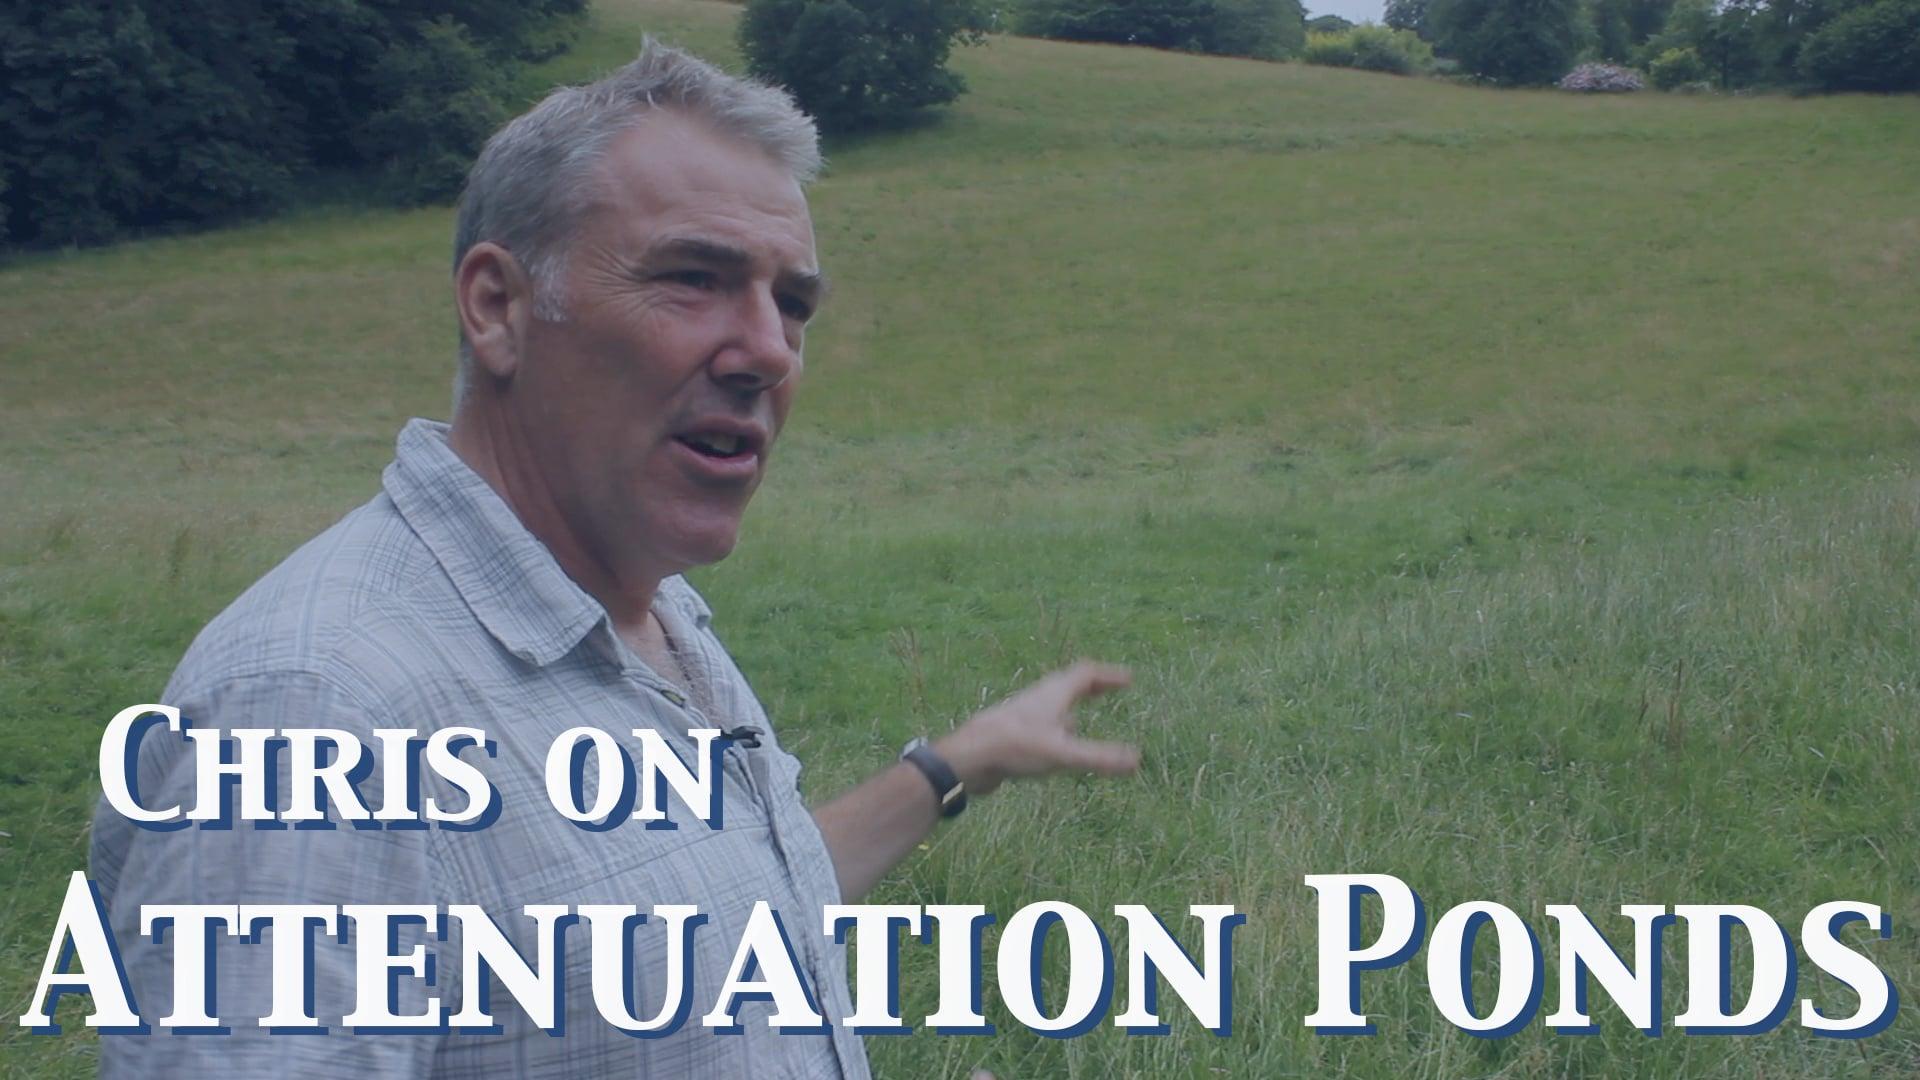 Chris on Attenuation Ponds